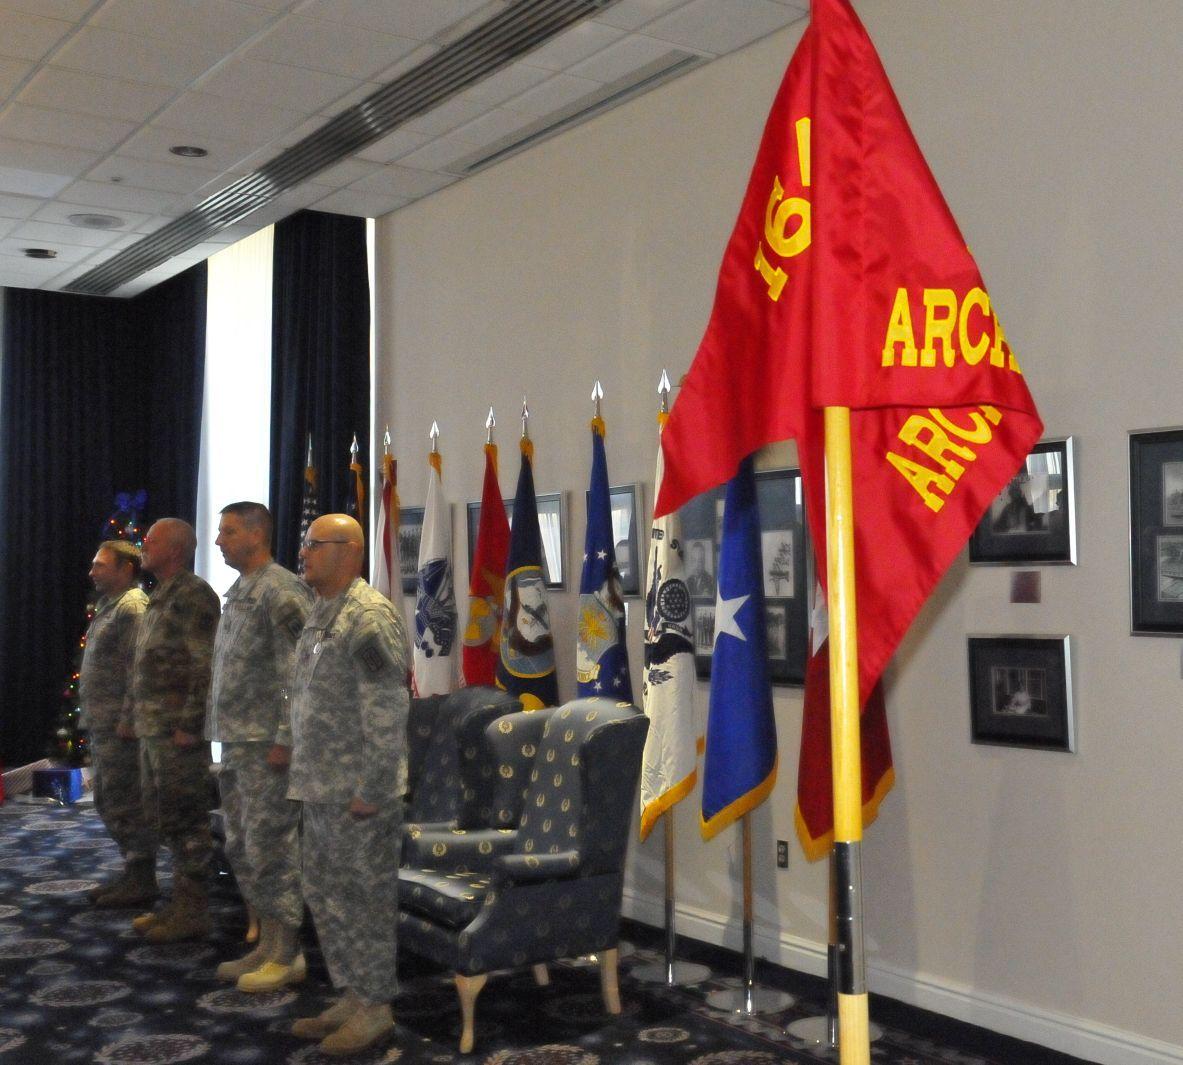 JADOC ToA Ceremony - Commanders with Task Force Archangel Guidon